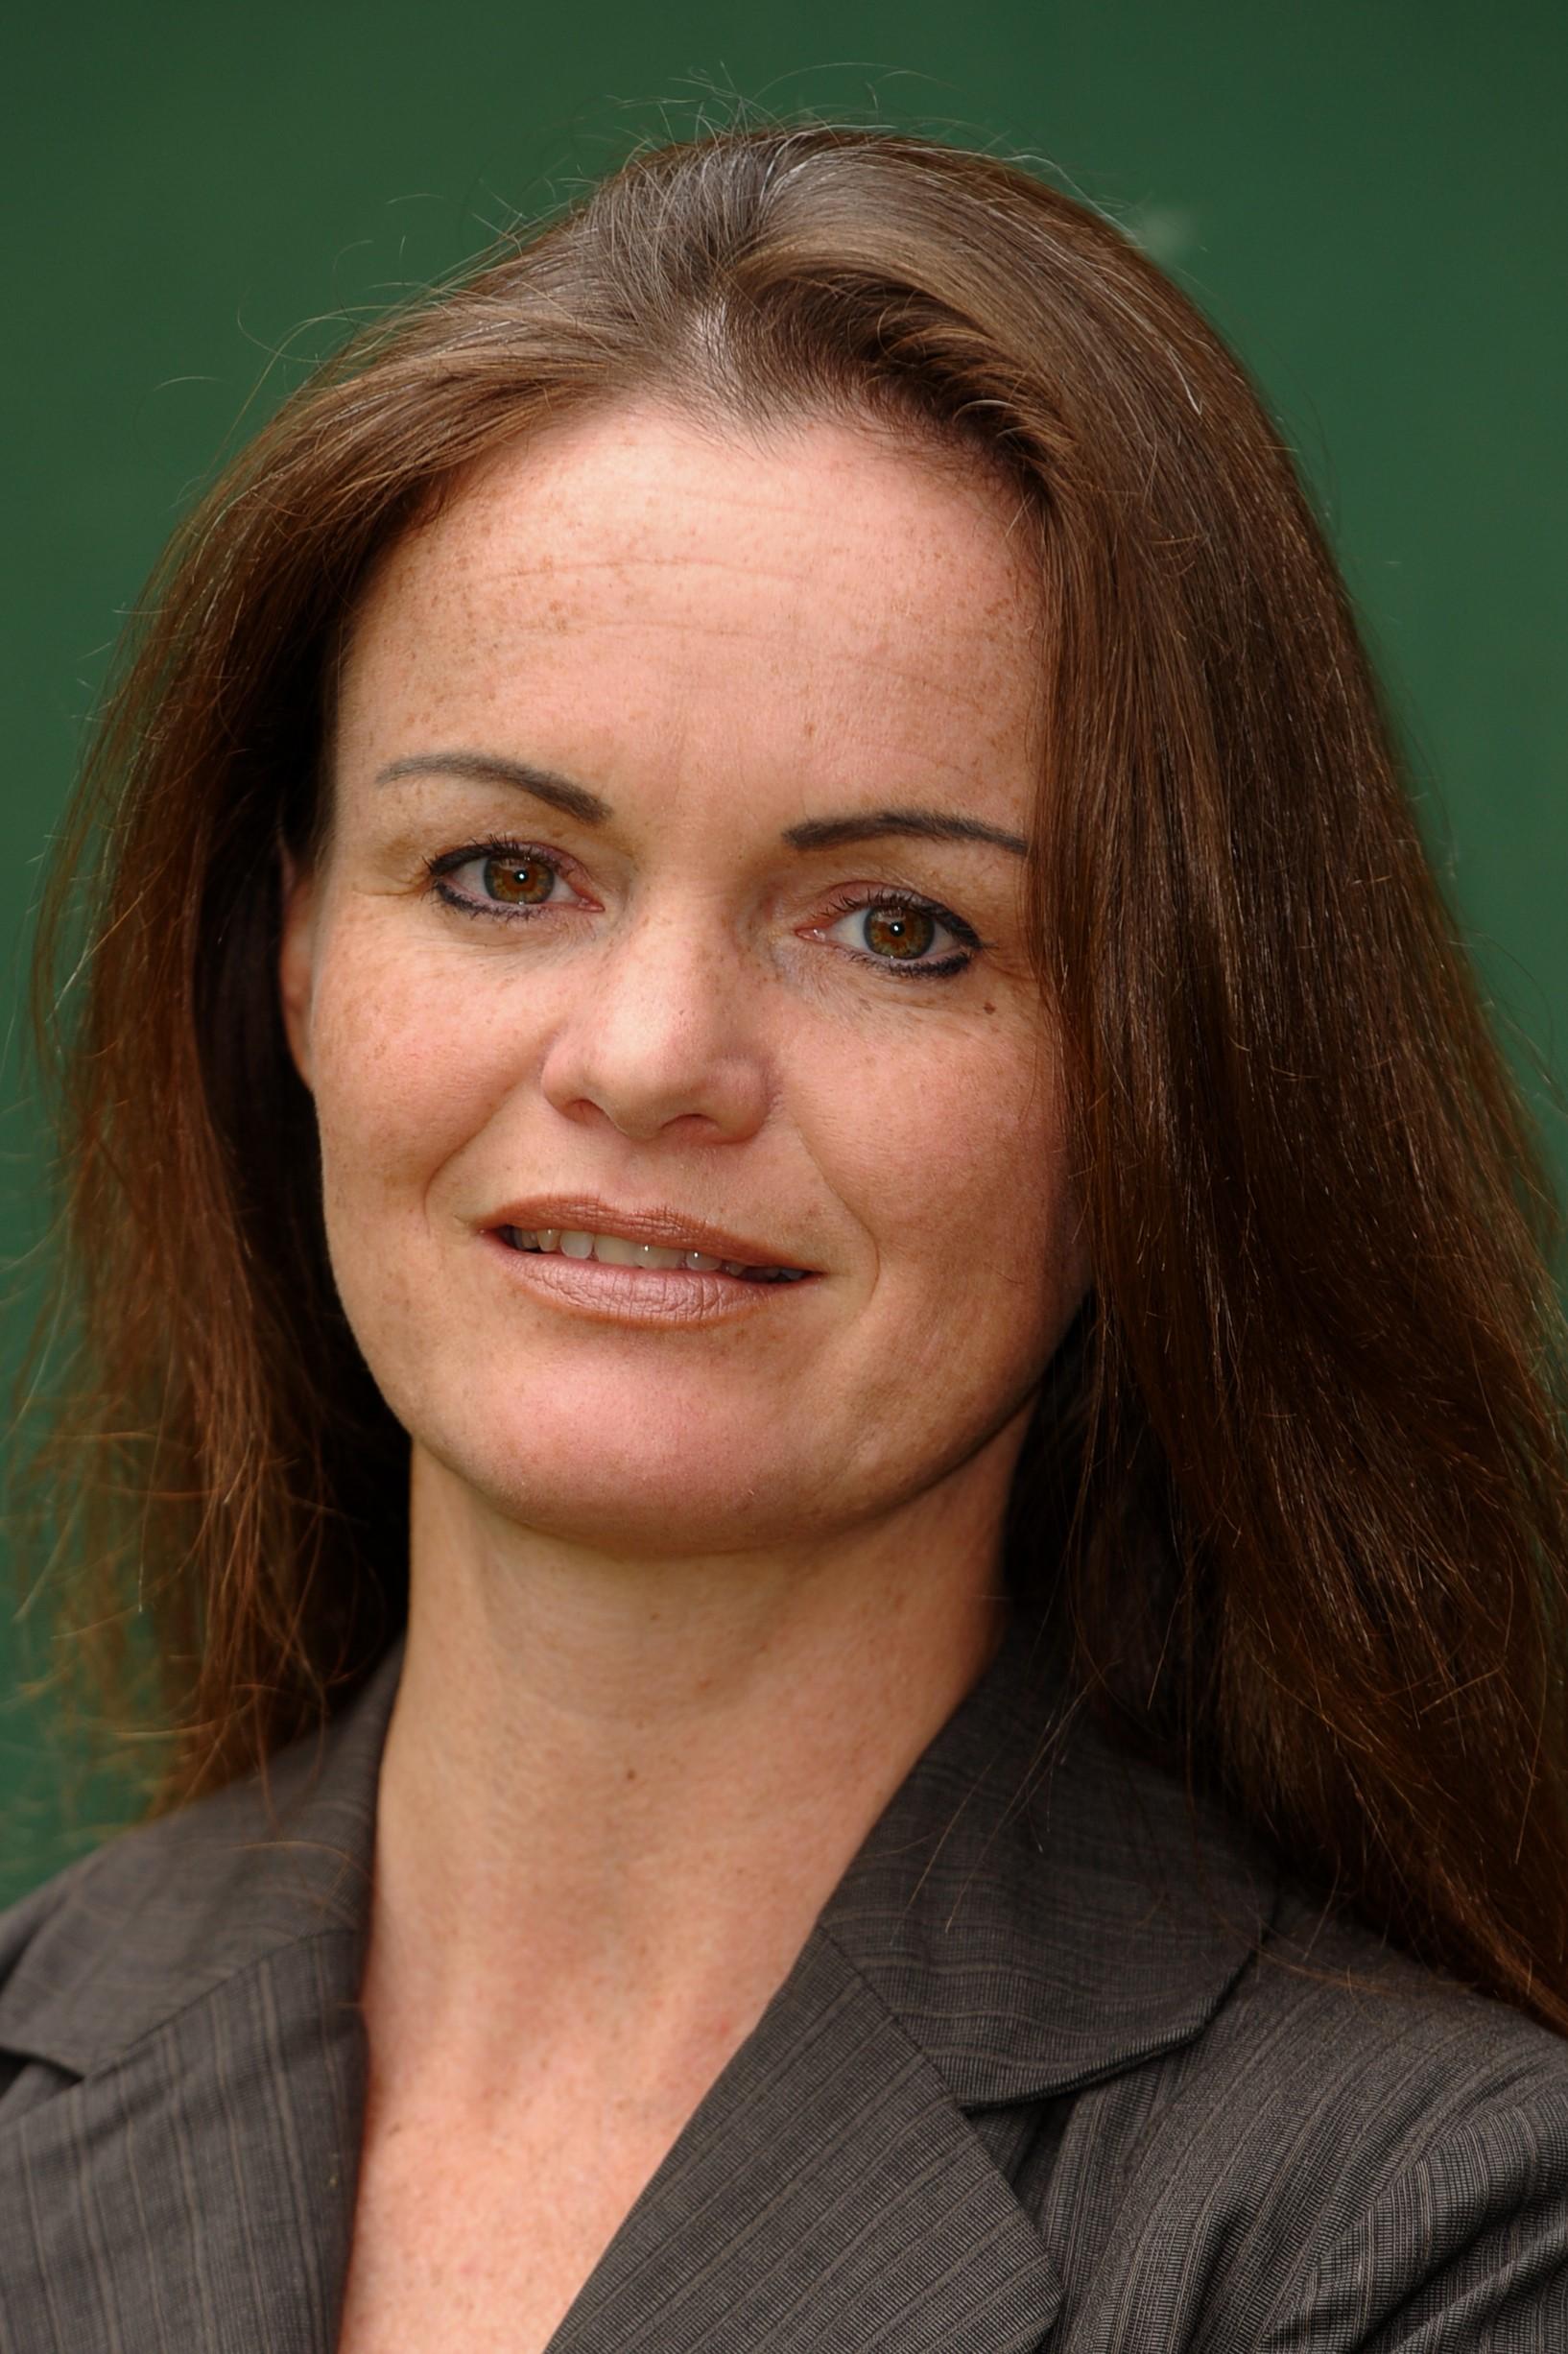 Katrin Rybacki